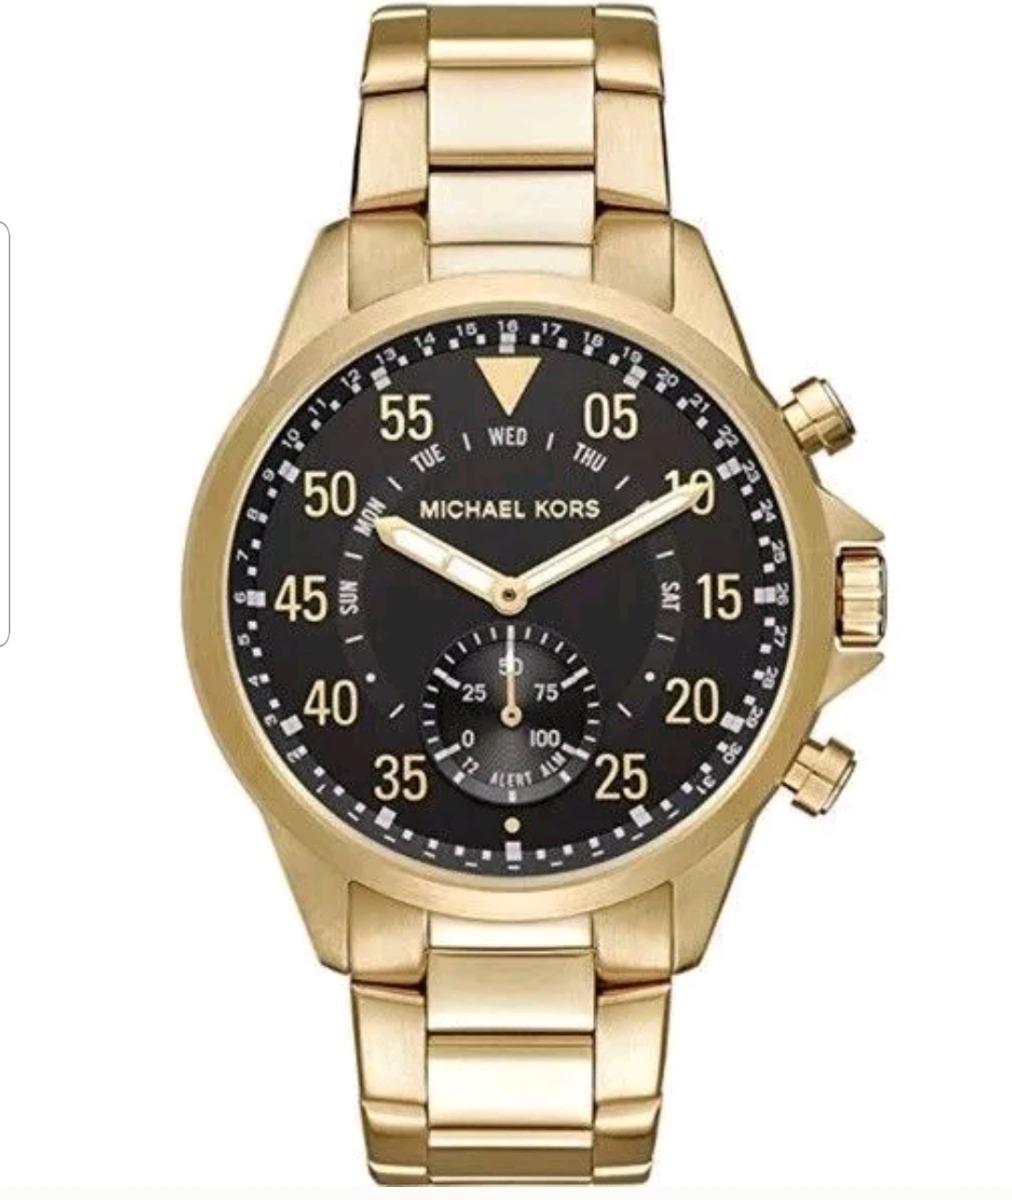 Mkt4008 Michael Reloj Reloj Kors Híbrido Híbrido Michael zqVpMSUG